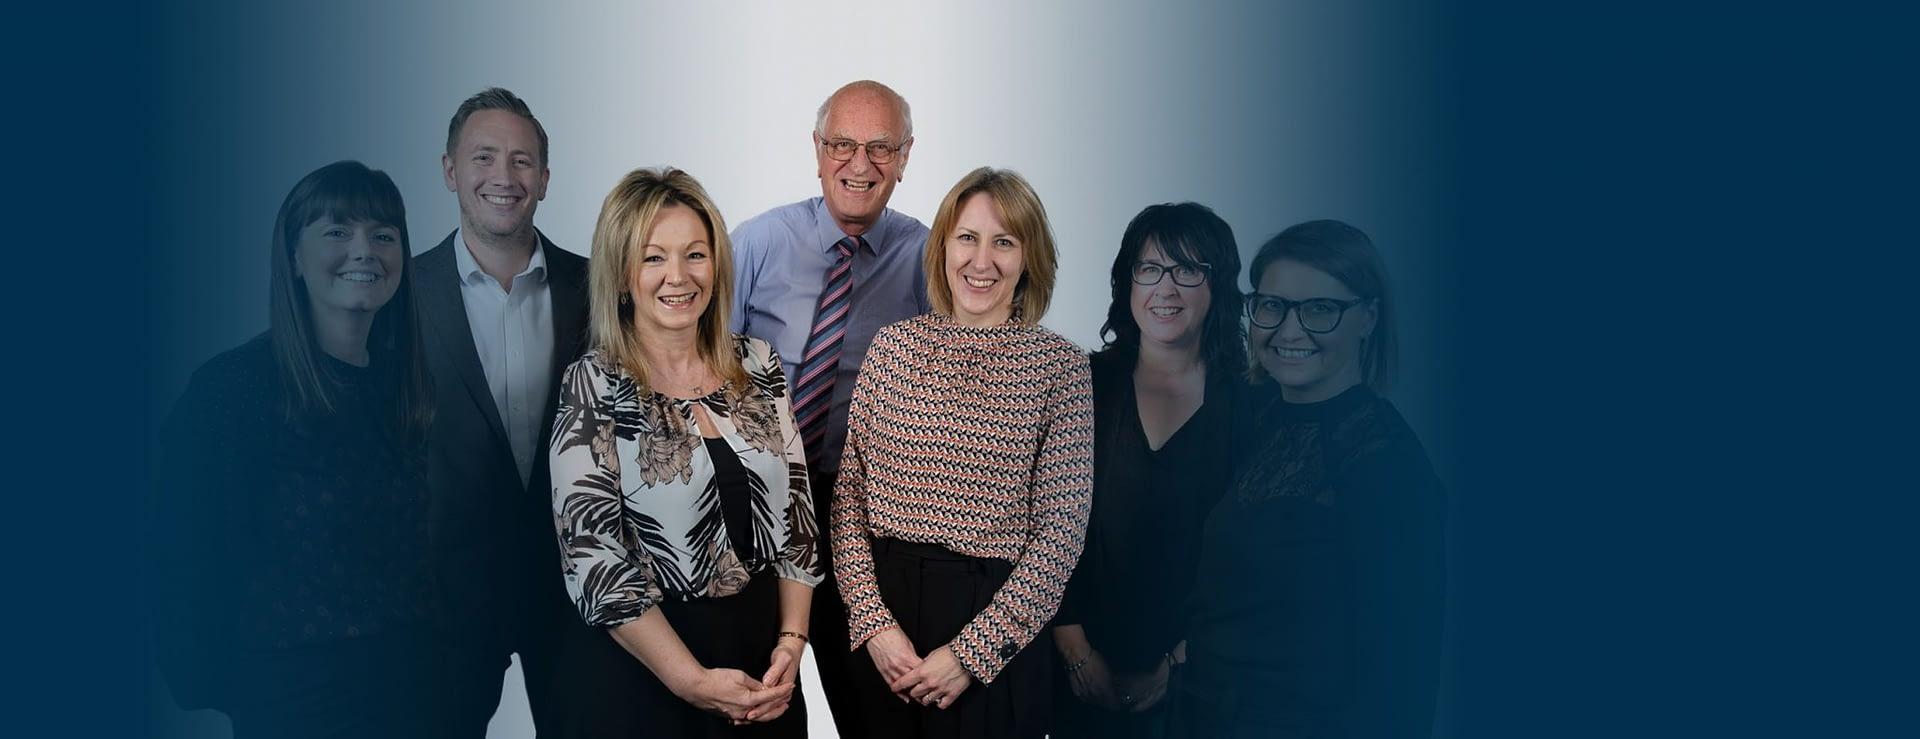 Meet the HB Accountants team